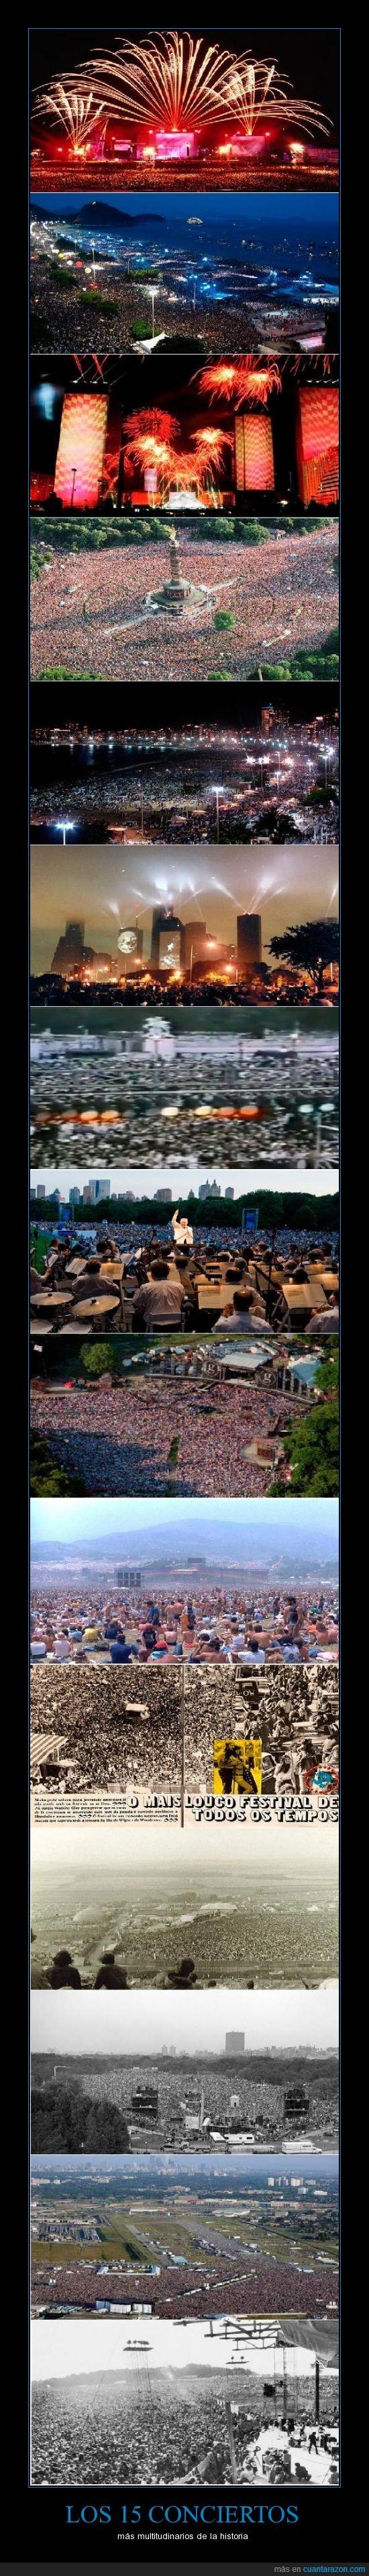 Conciertos,Garth Brooks,Jean Michel Jarre,Love Parade,Multitud,Rod Stewart,Simon & Garfunkel,The Rolling Stones,Woodstock